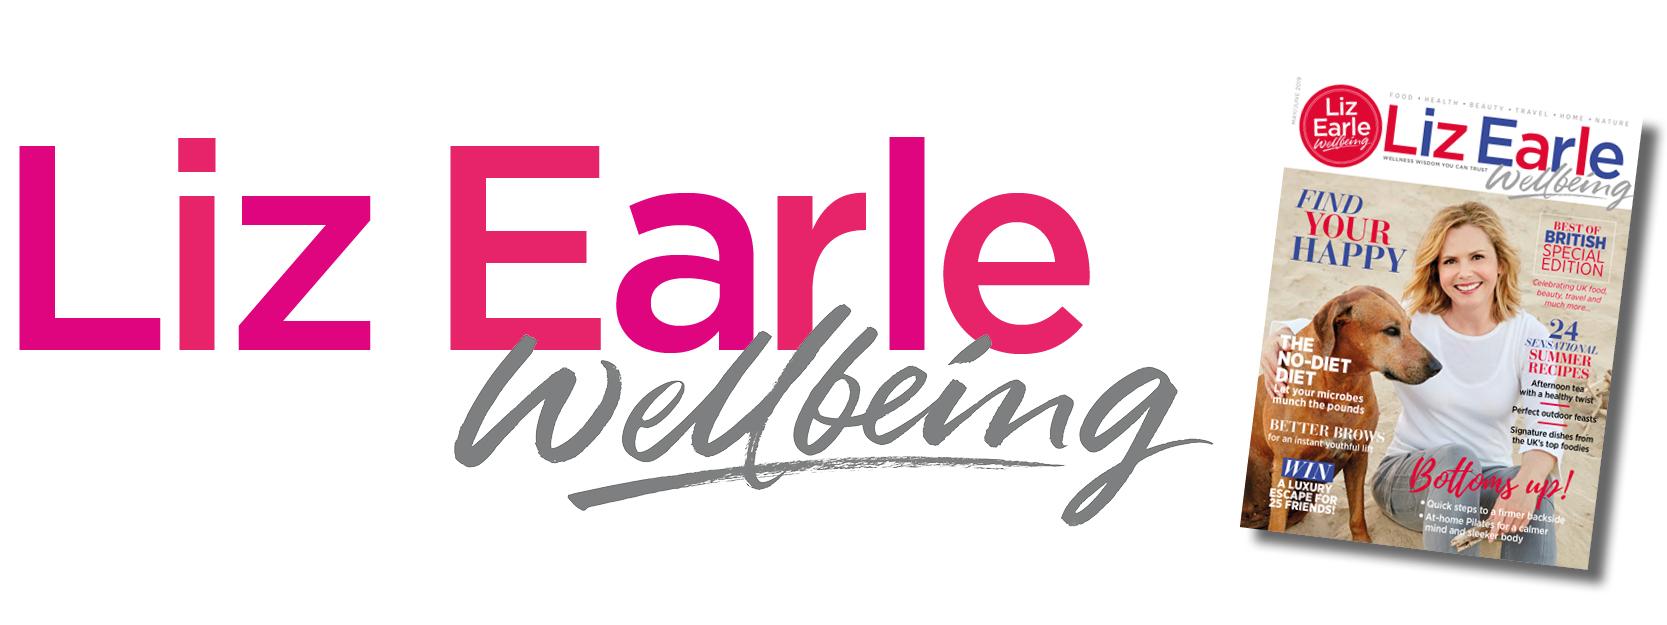 fcac54cea Meet the team - Liz Earle Wellbeing